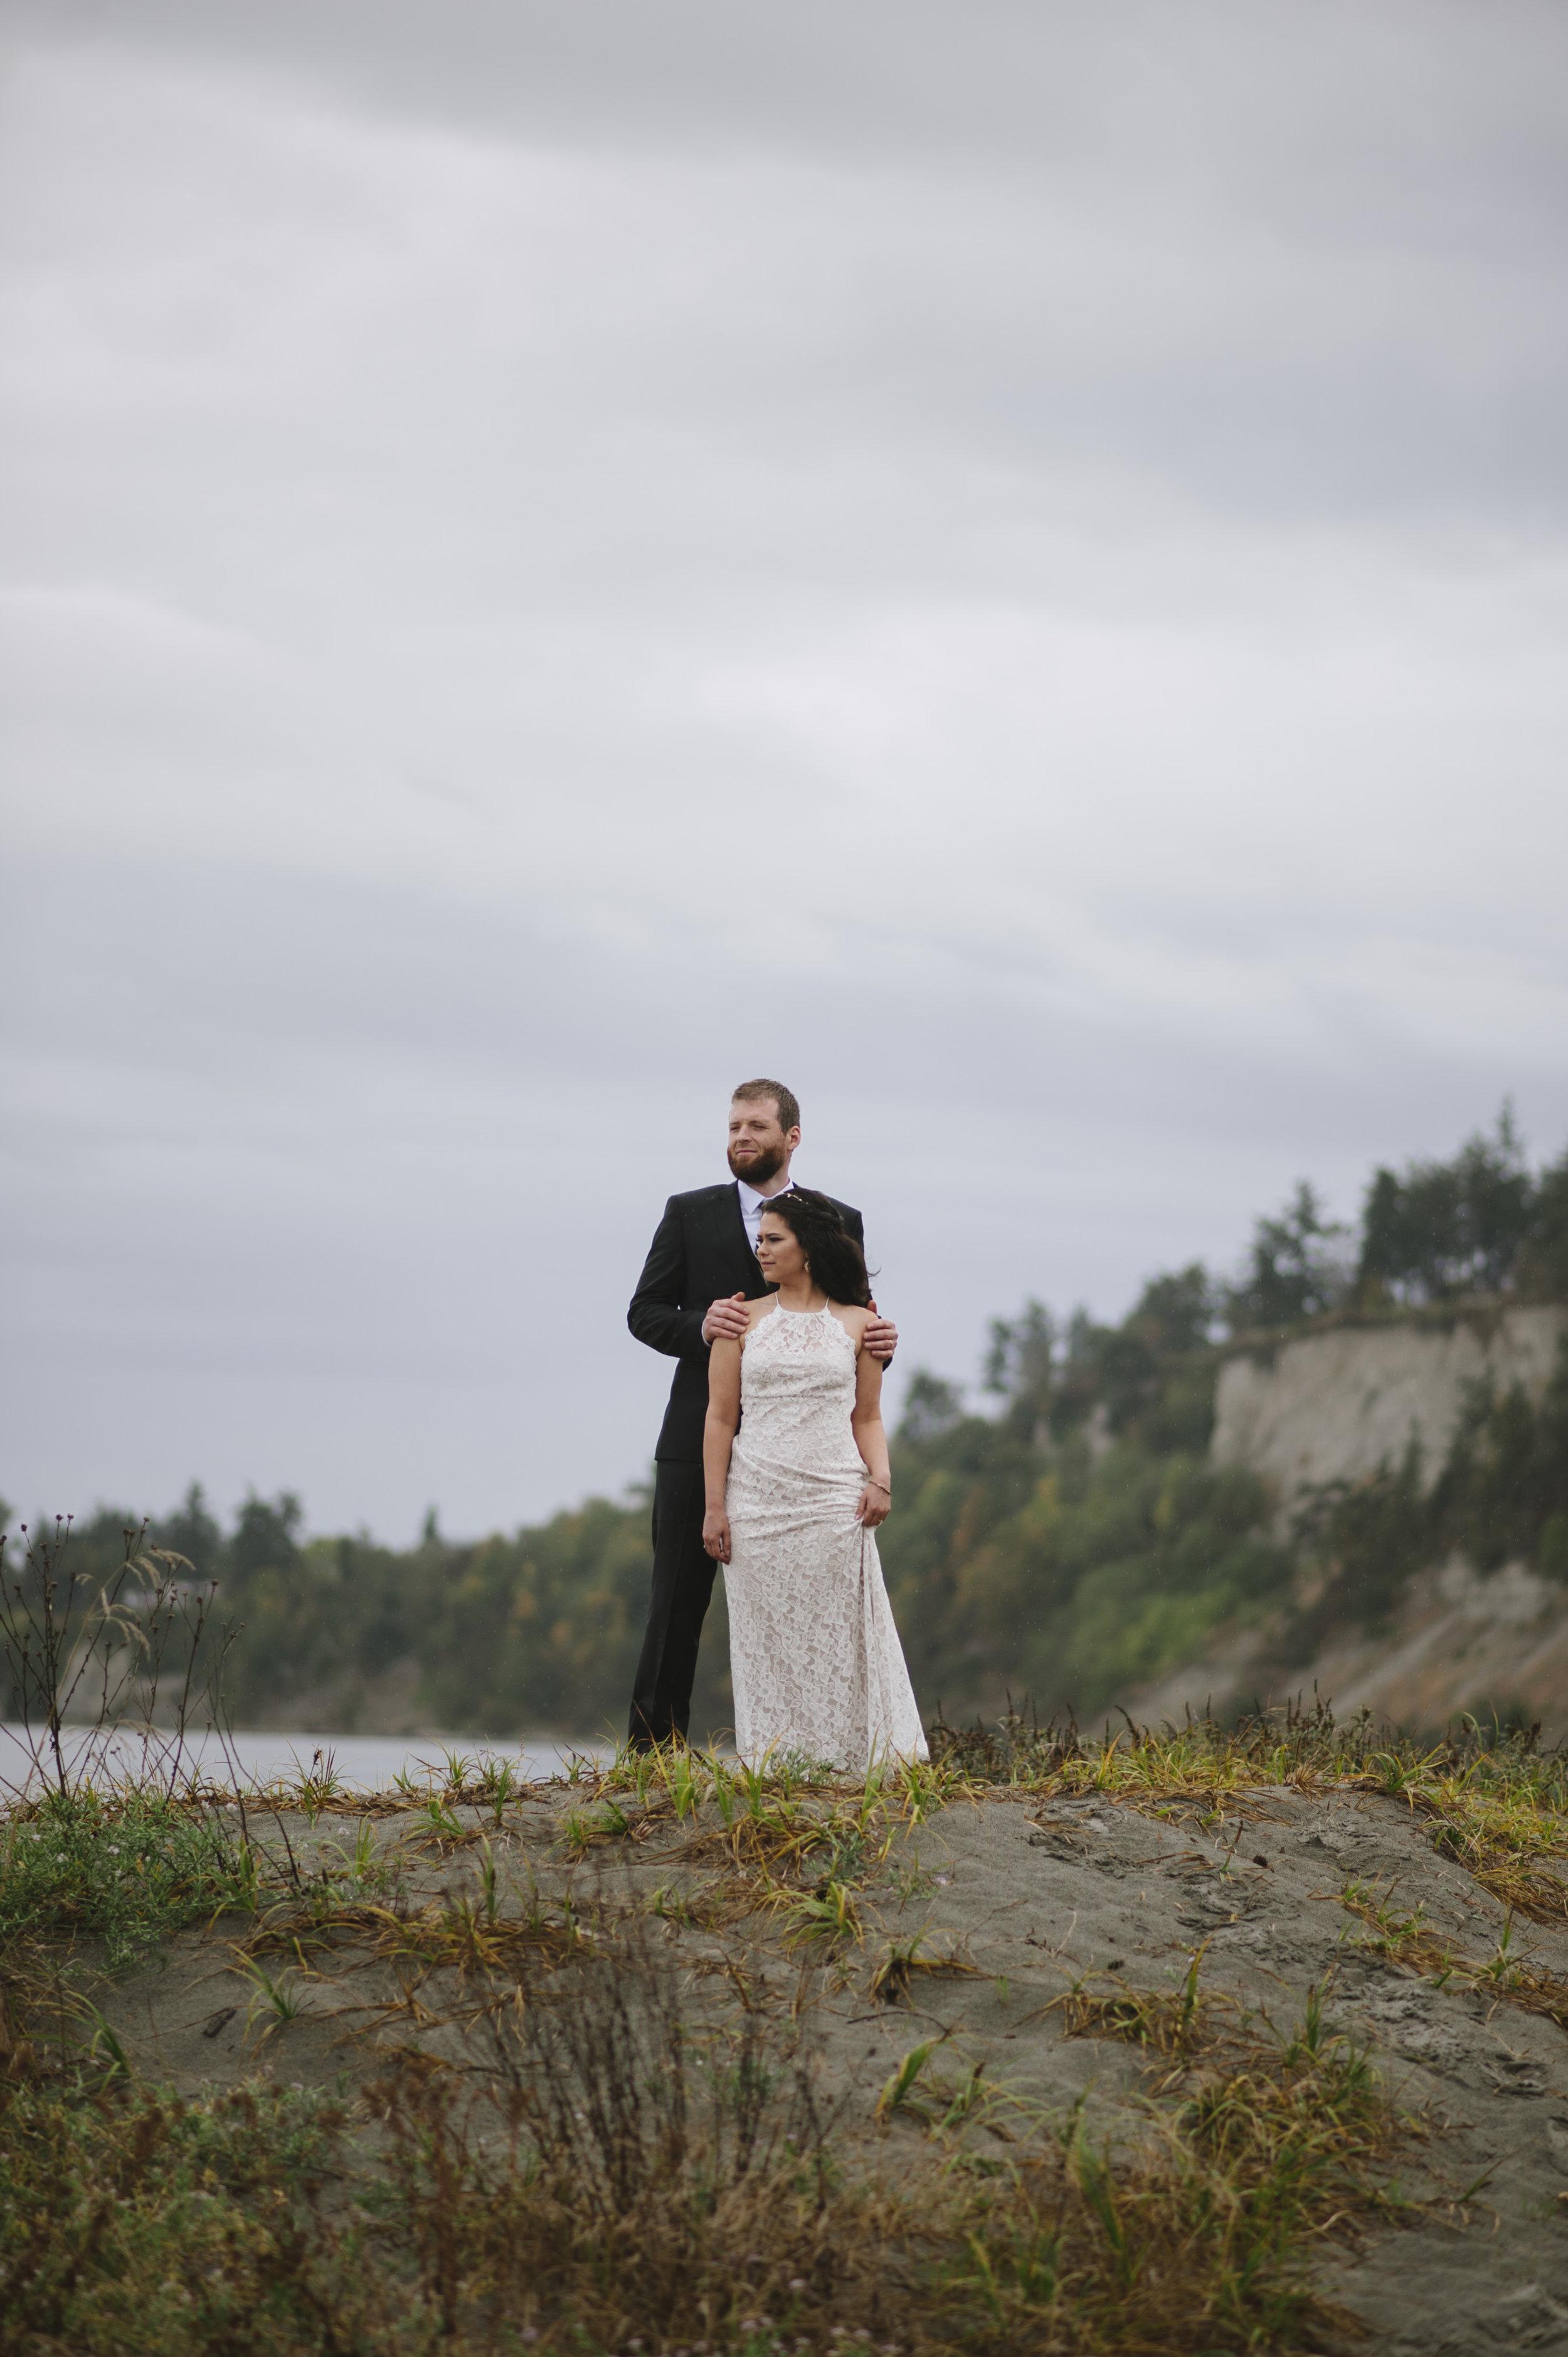 Beach, Couple, Washington State